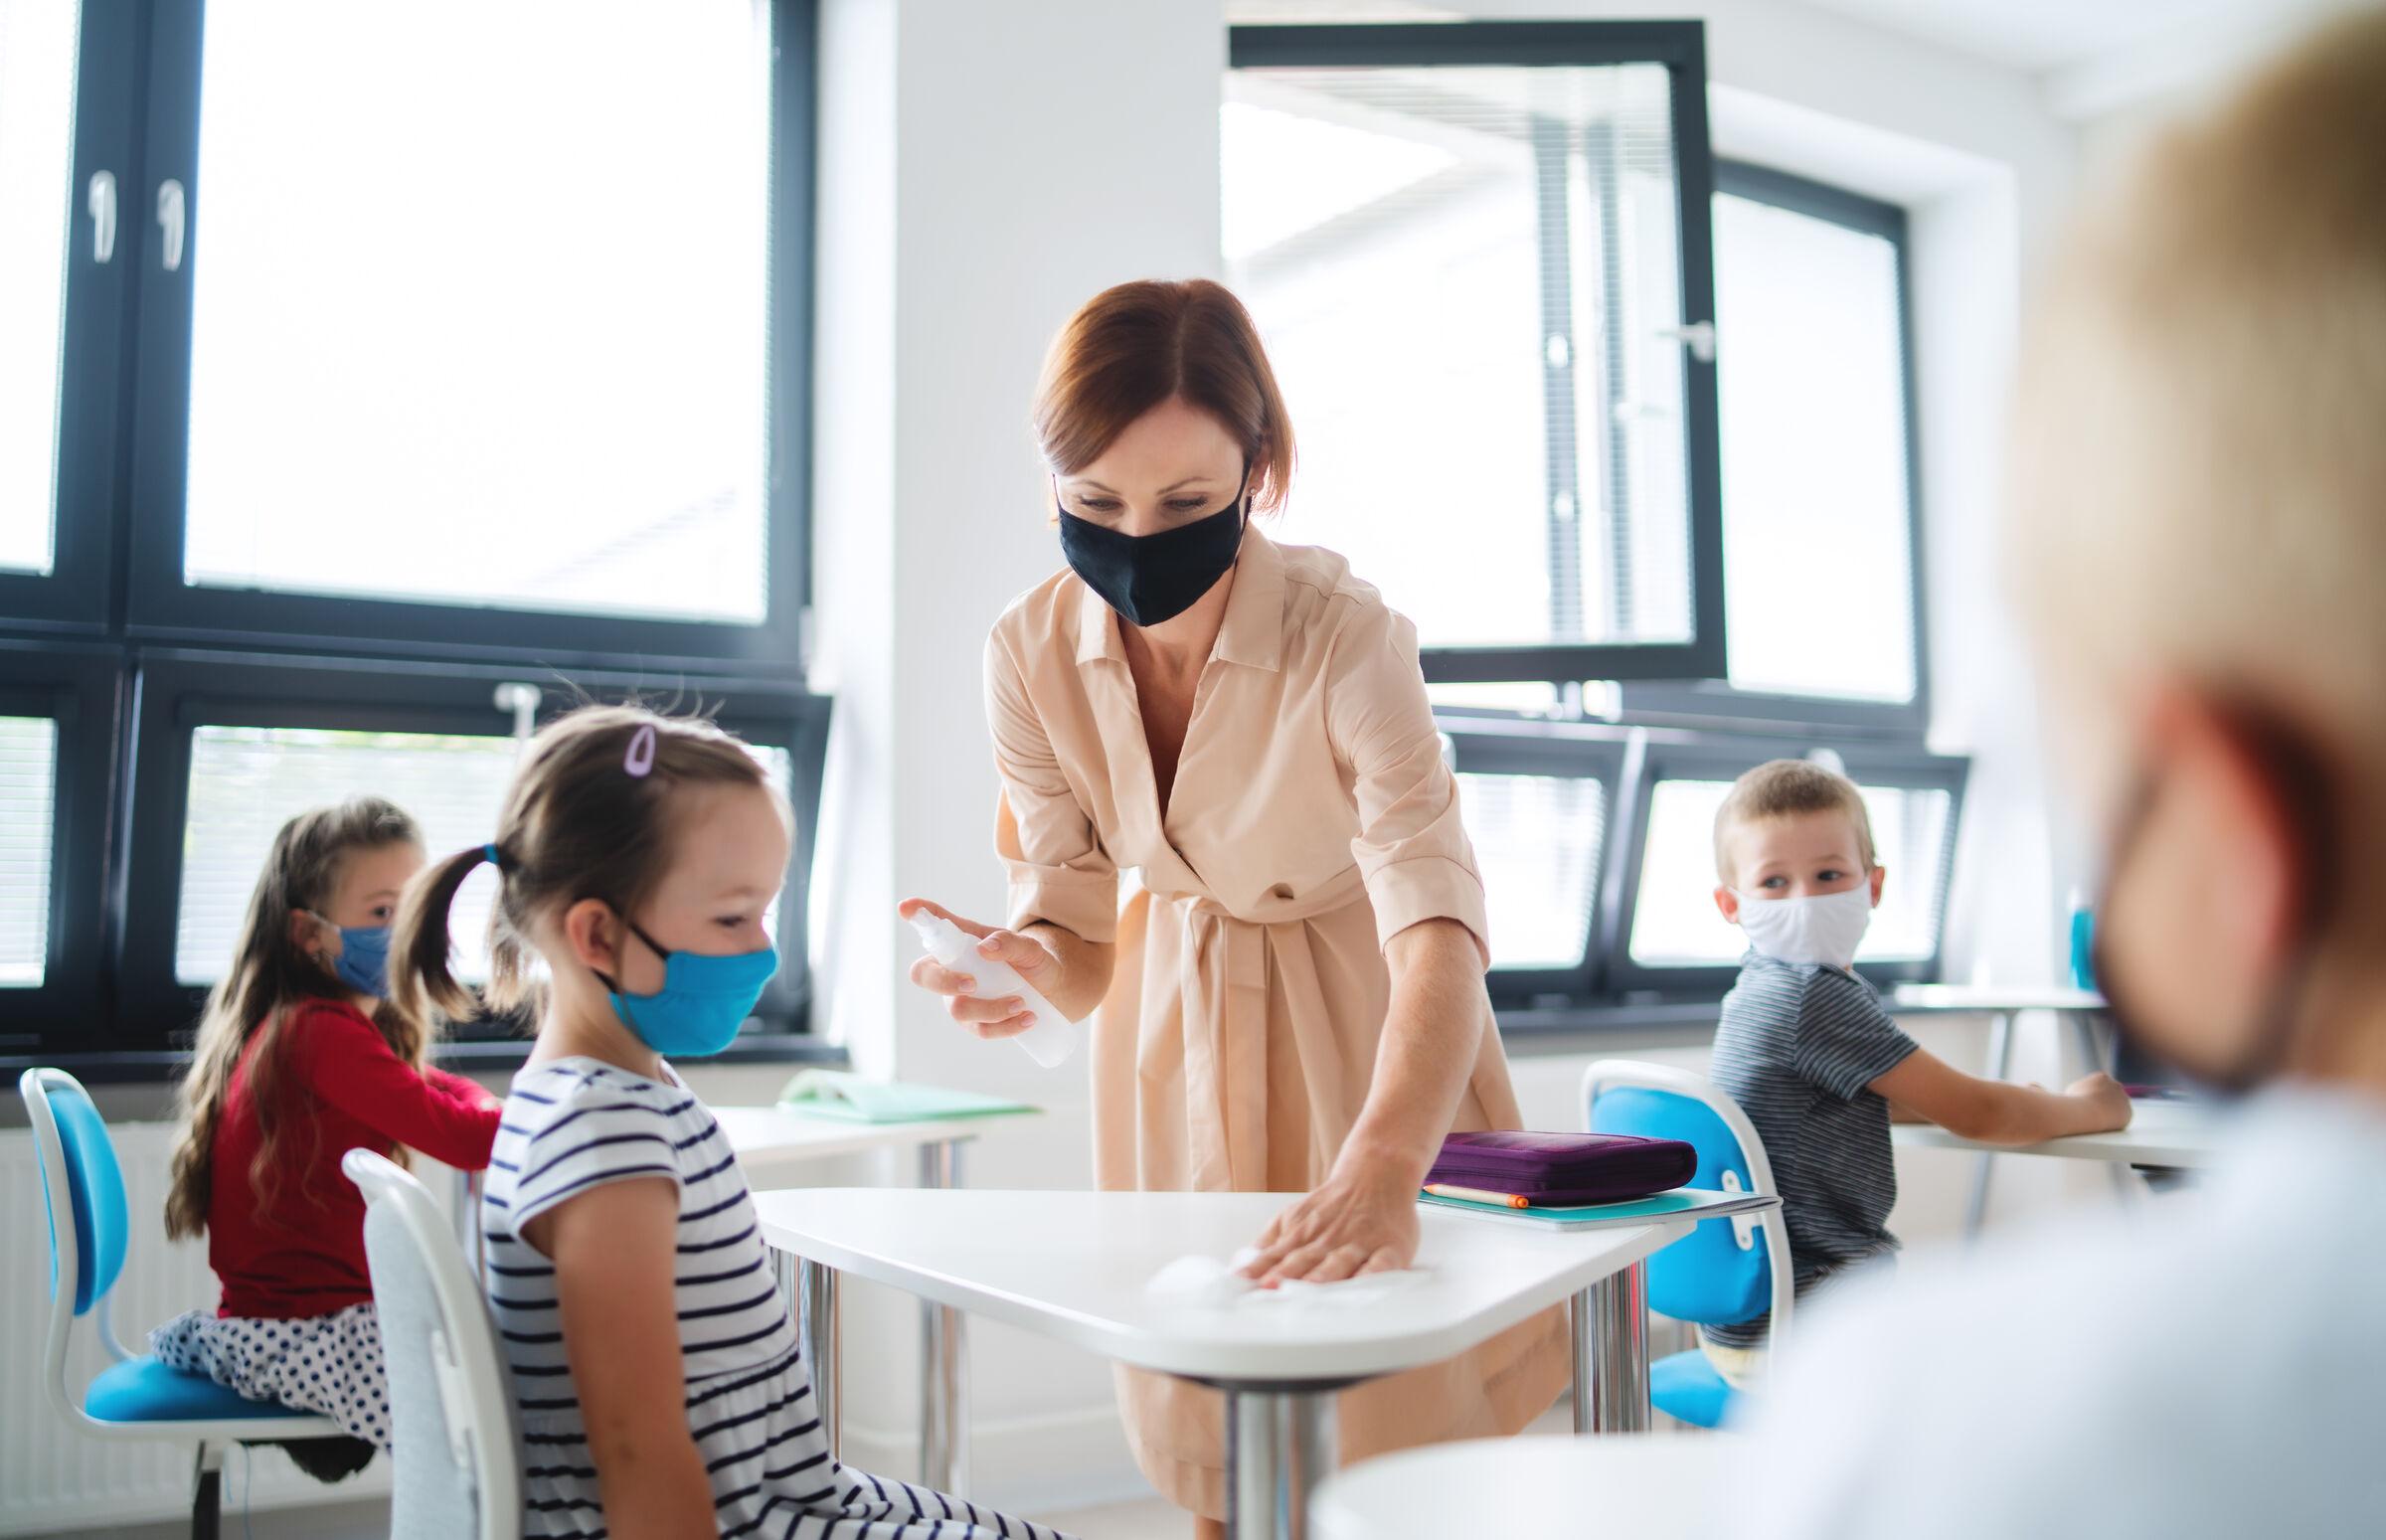 Professora-limpando-a-mesa-da-aluna